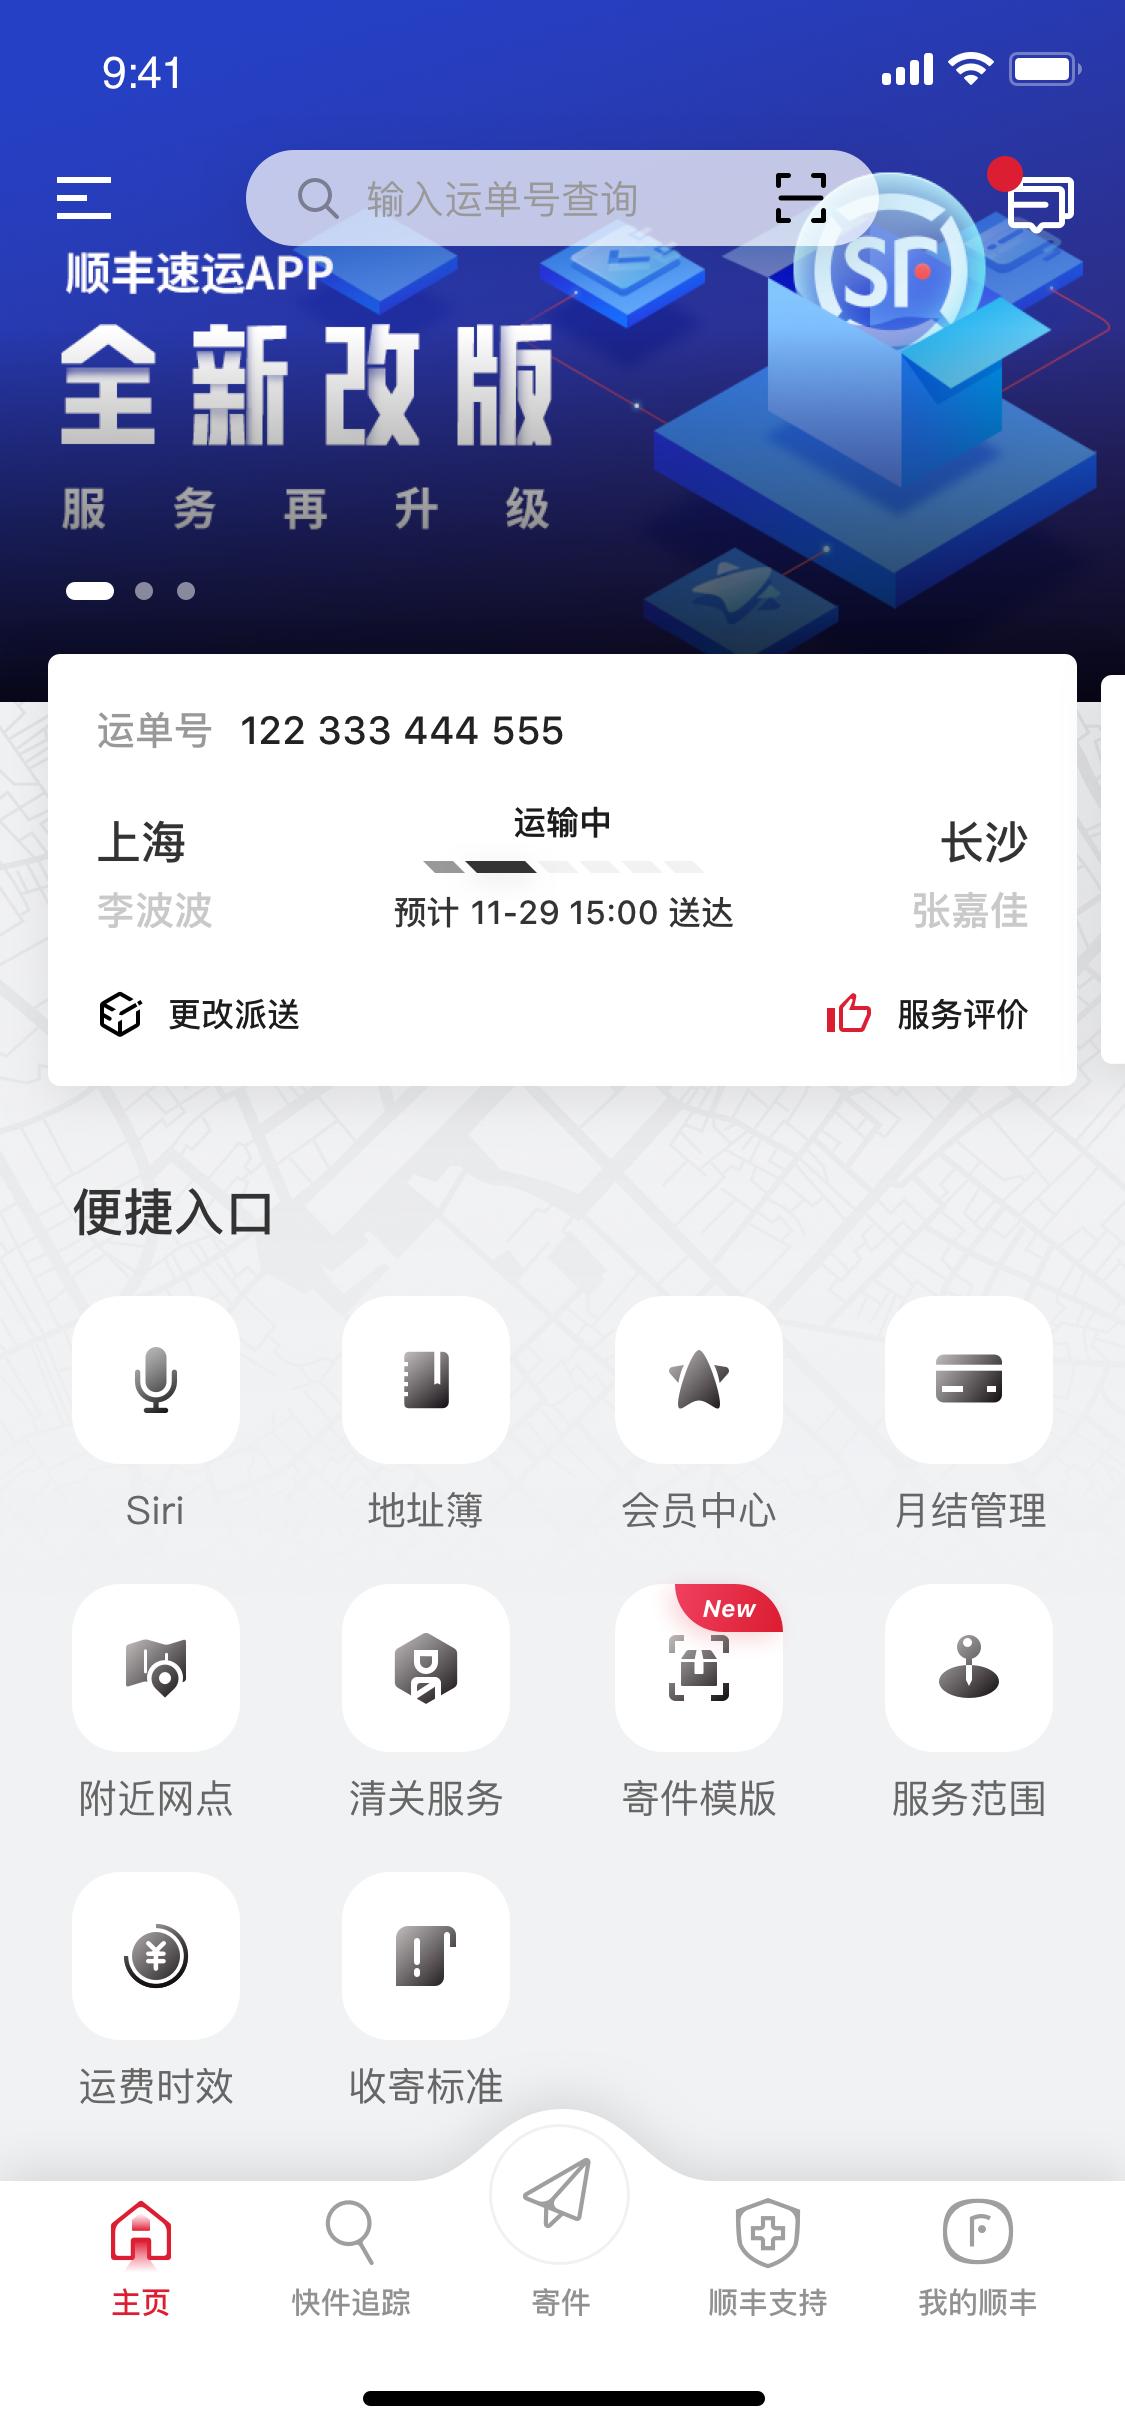 SF Express App